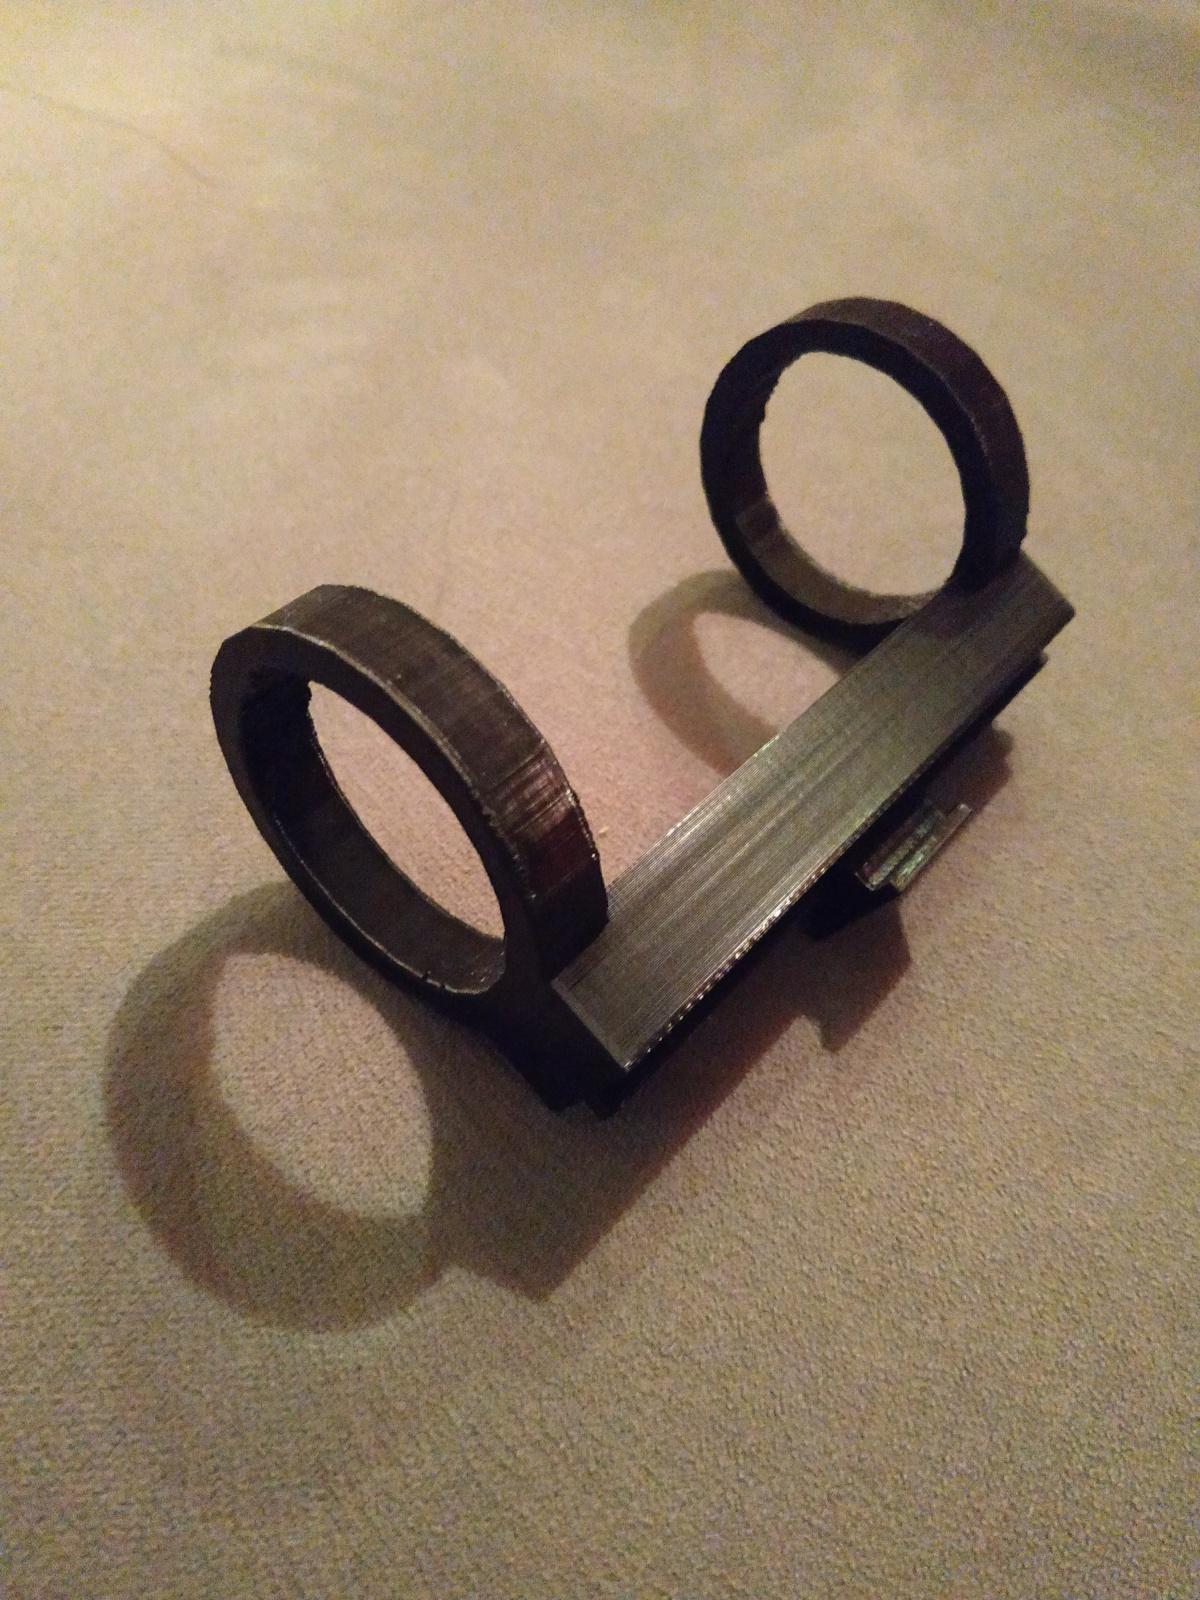 Canon1.thumb.jpg.d0aa83bc20534b0a94f190e701f49c86.jpg